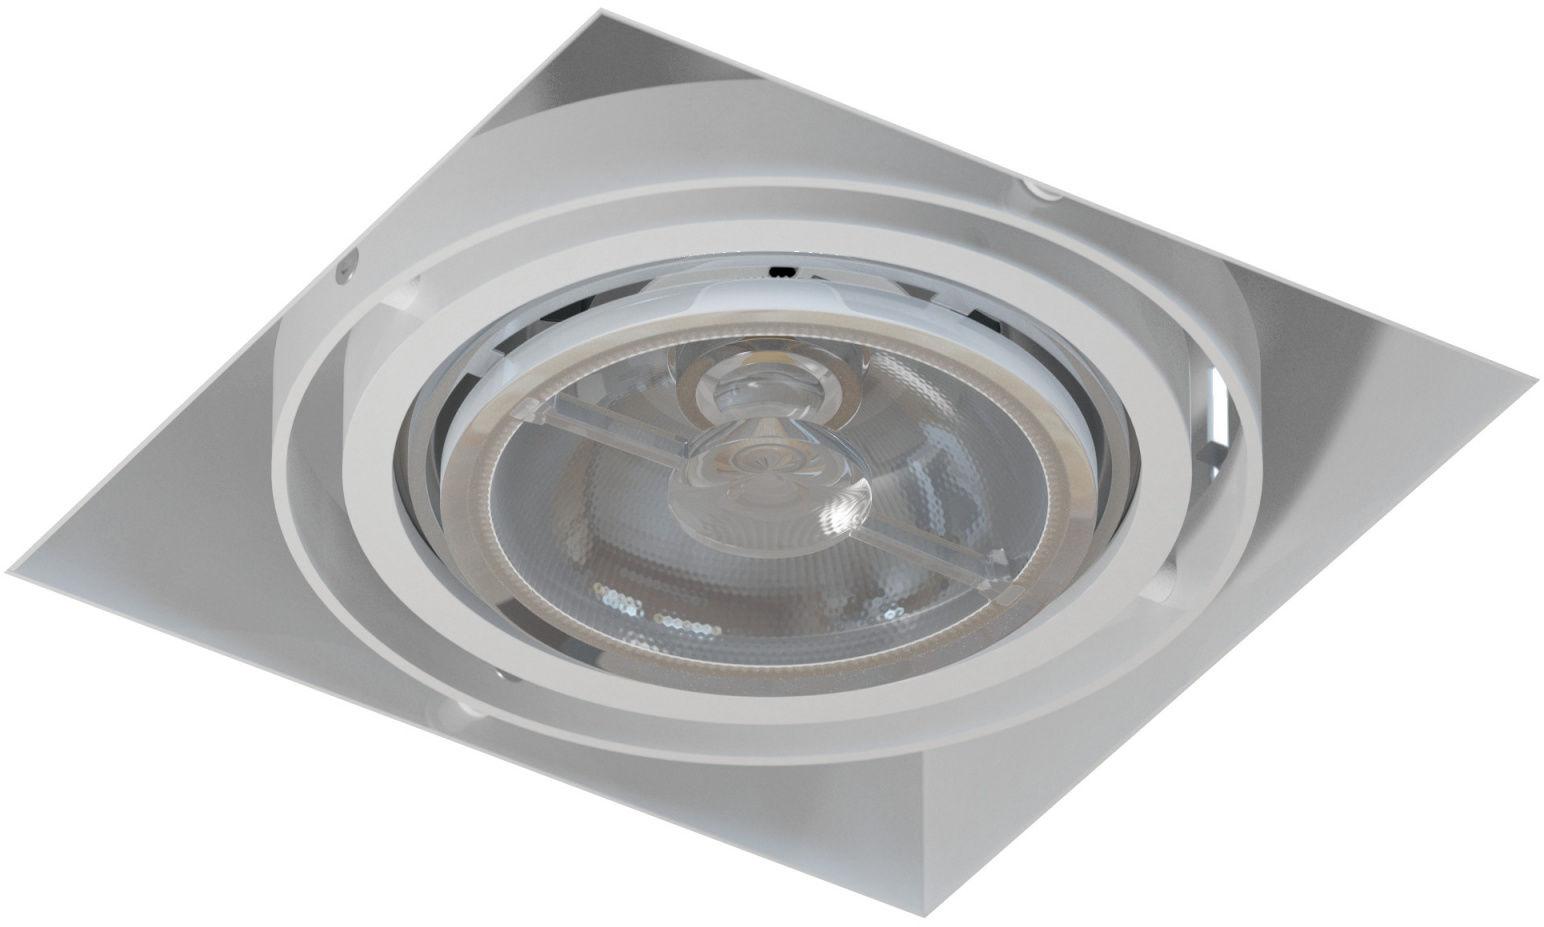 Oprawa wpuszczana bezramkowa Mara T018PB1Ah117 Cleoni nowoczesna lampa sufitowa